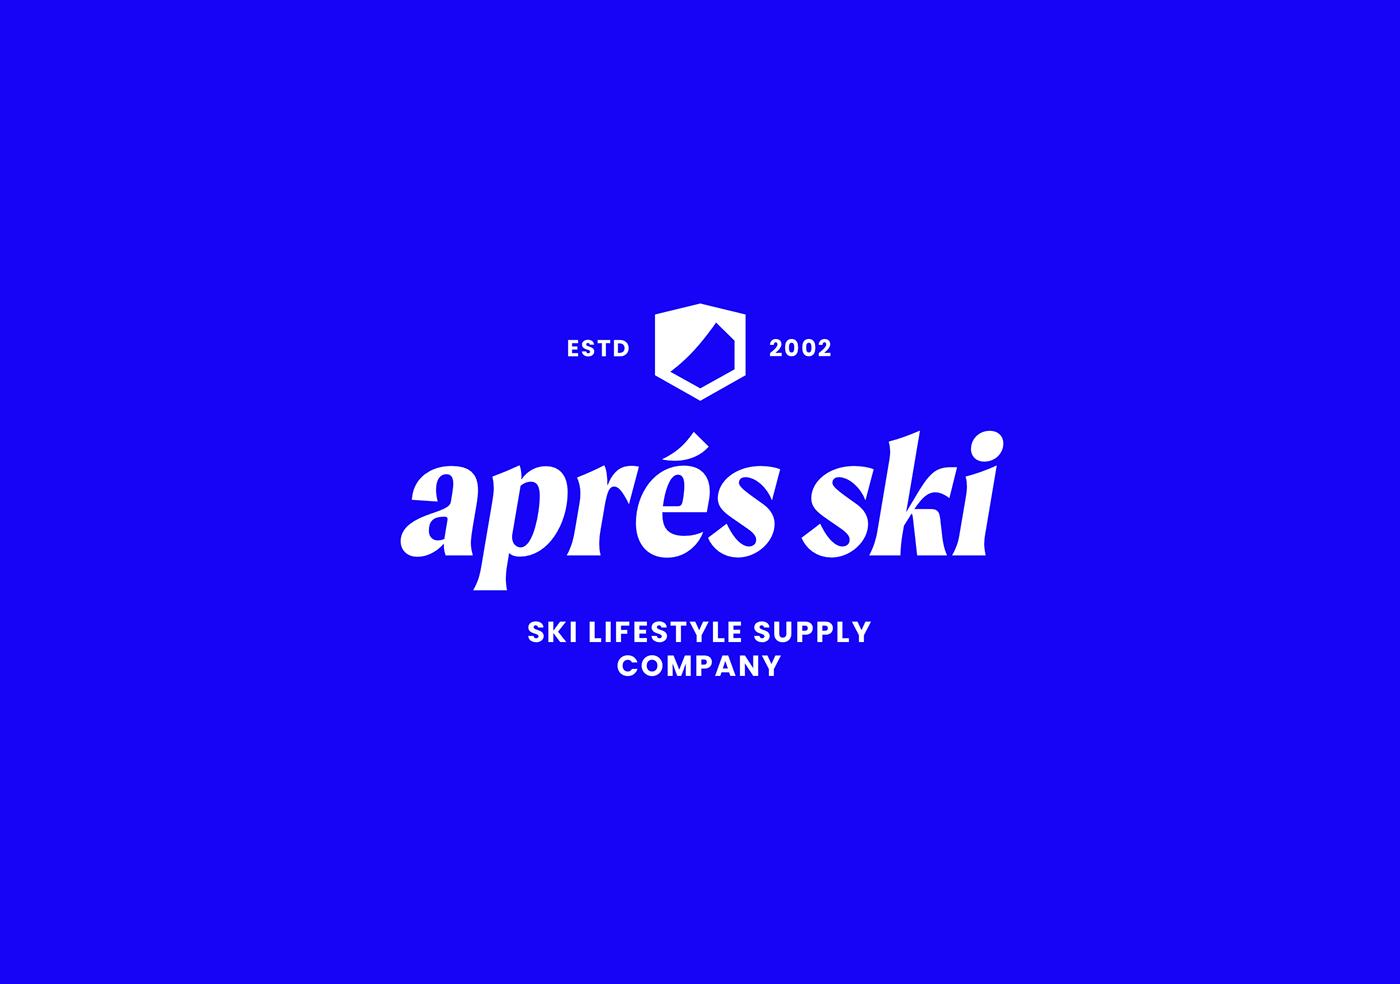 adventure brand Clothing france lifestyle modern mountains québécois Ski